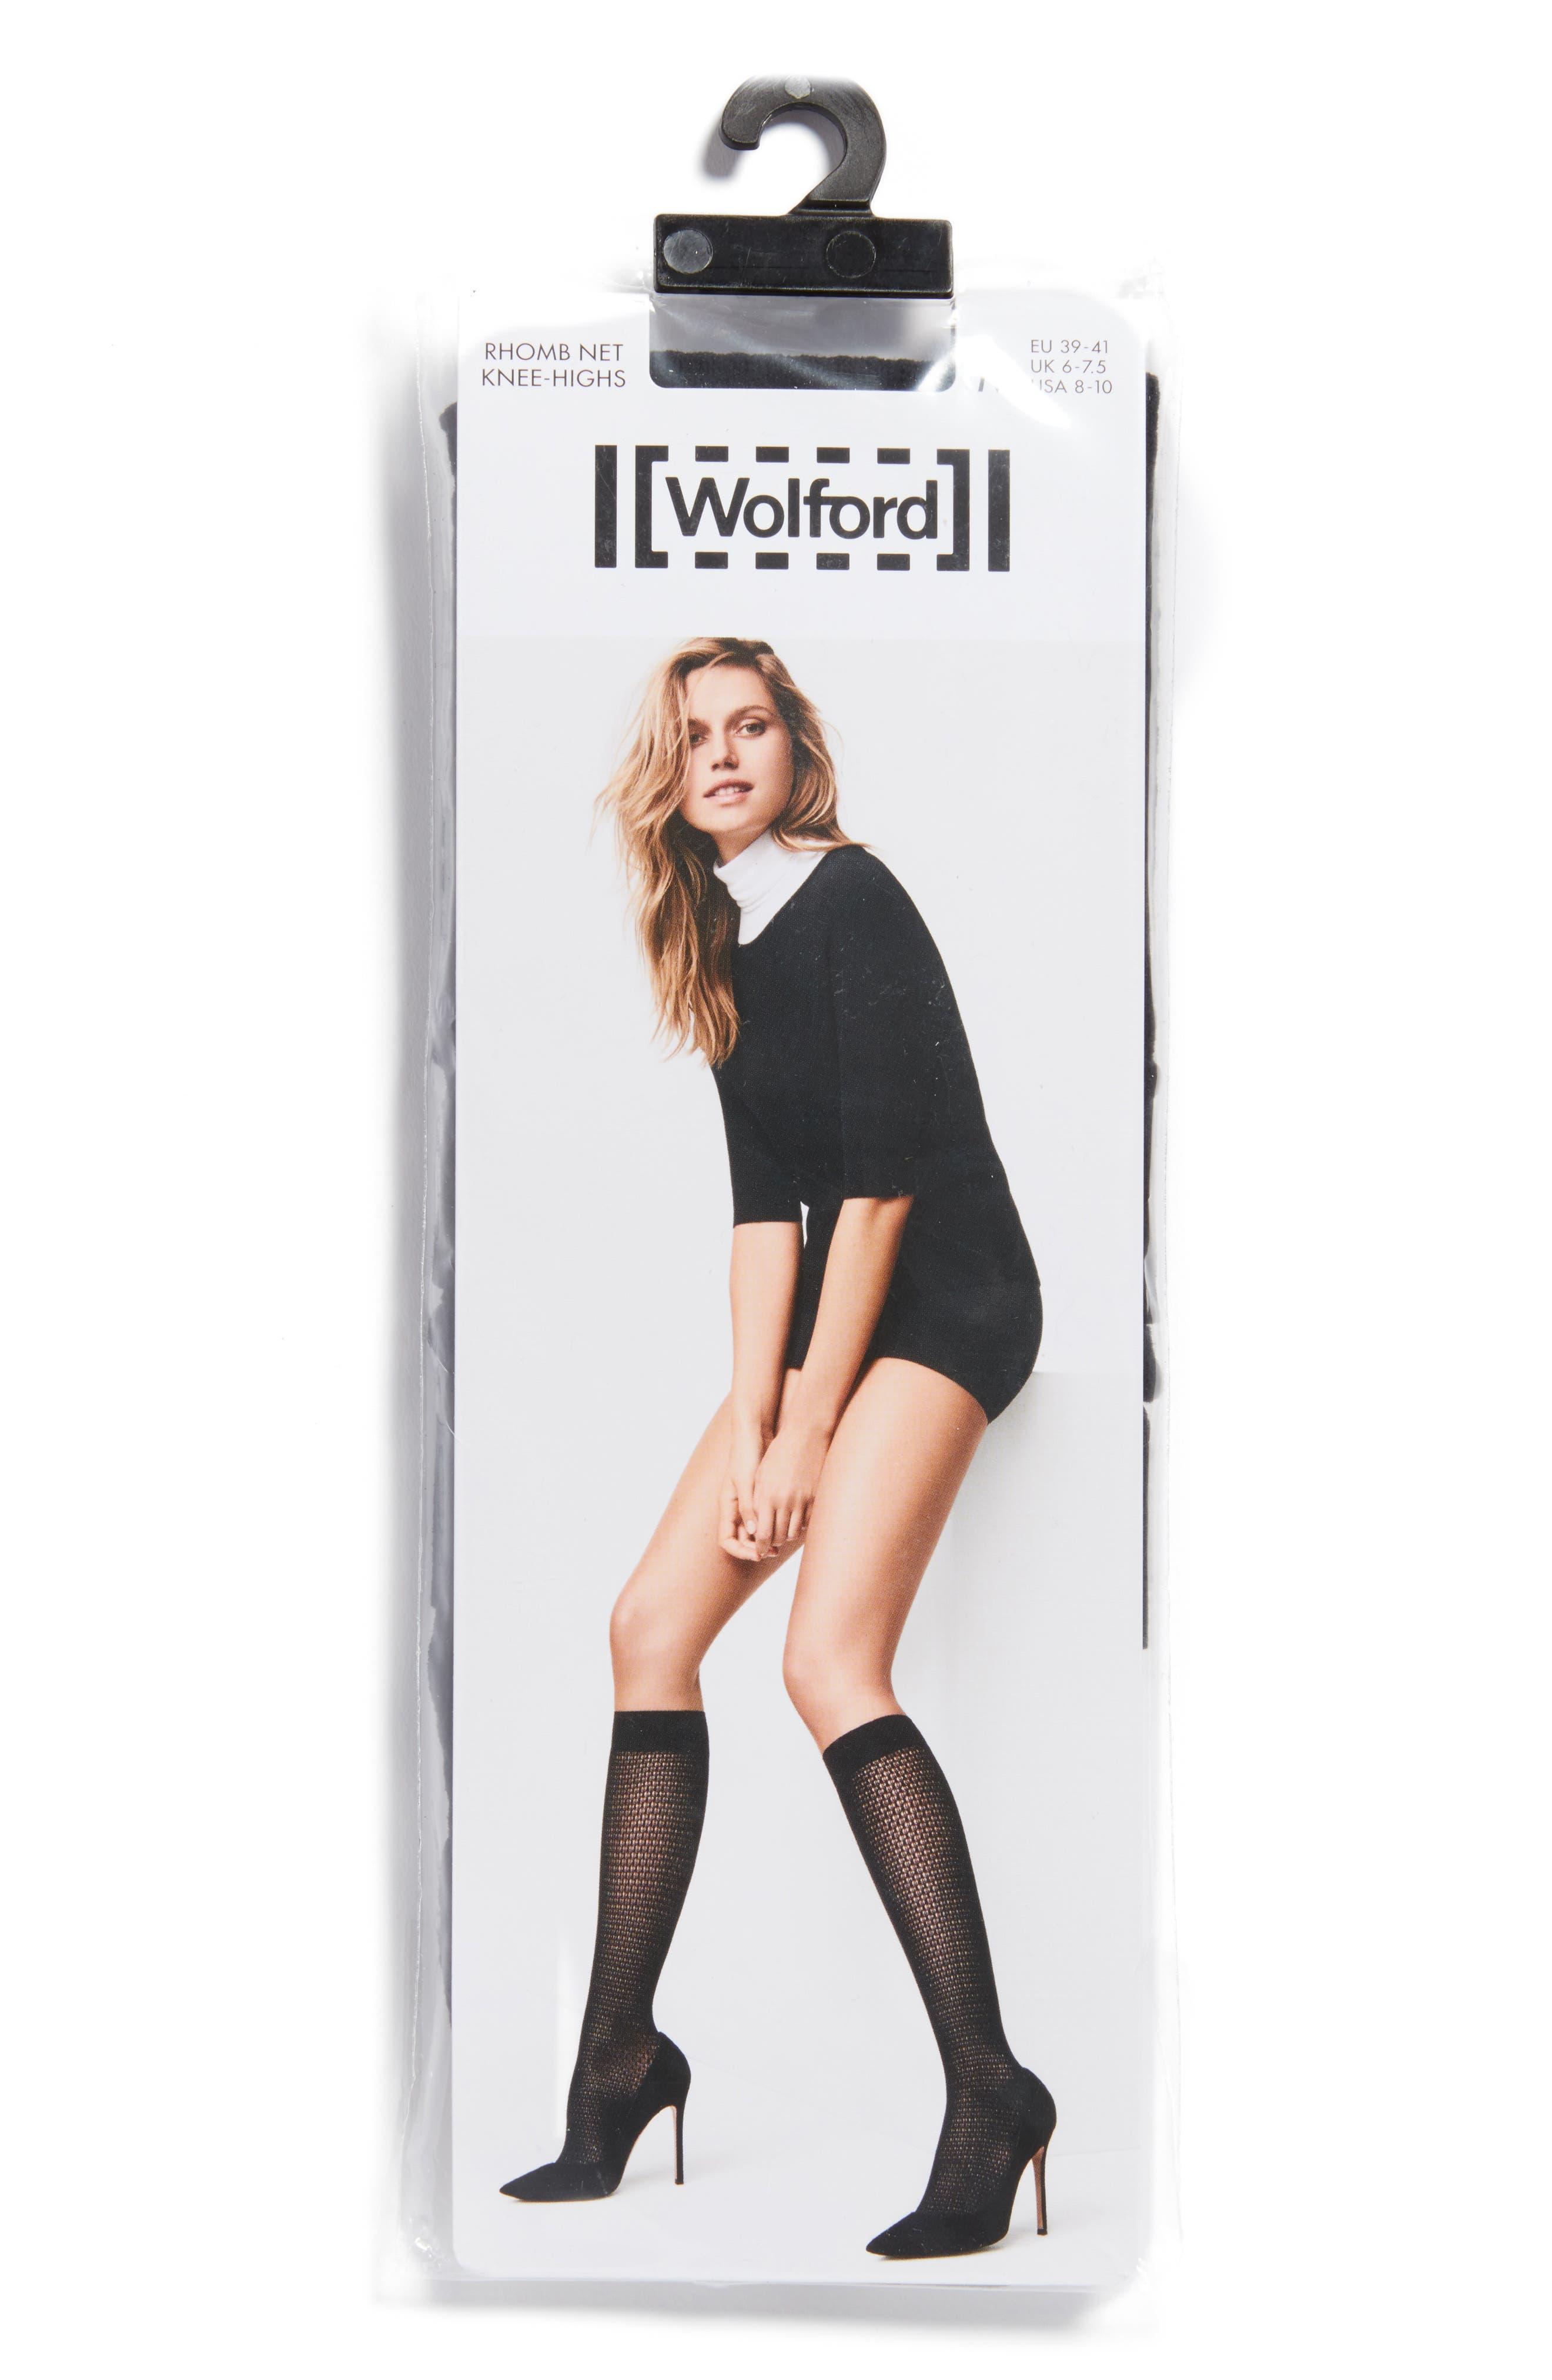 Rhomb Net Knee High Stockings,                             Alternate thumbnail 2, color,